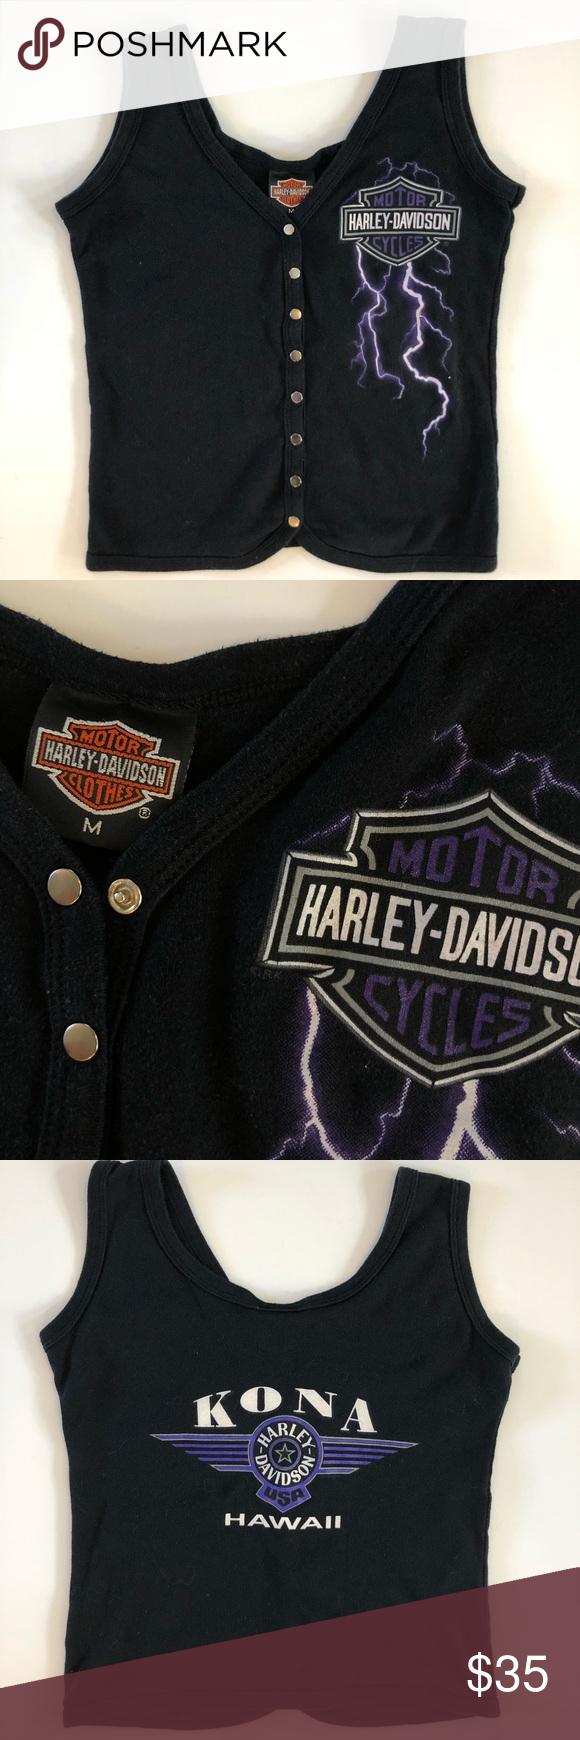 Kona Harley Davidson : harley, davidson, Harley, Davidson, Hawaii, Womens, Motorcycles, Ma…, Tops,, Sleeveless, Tshirt,